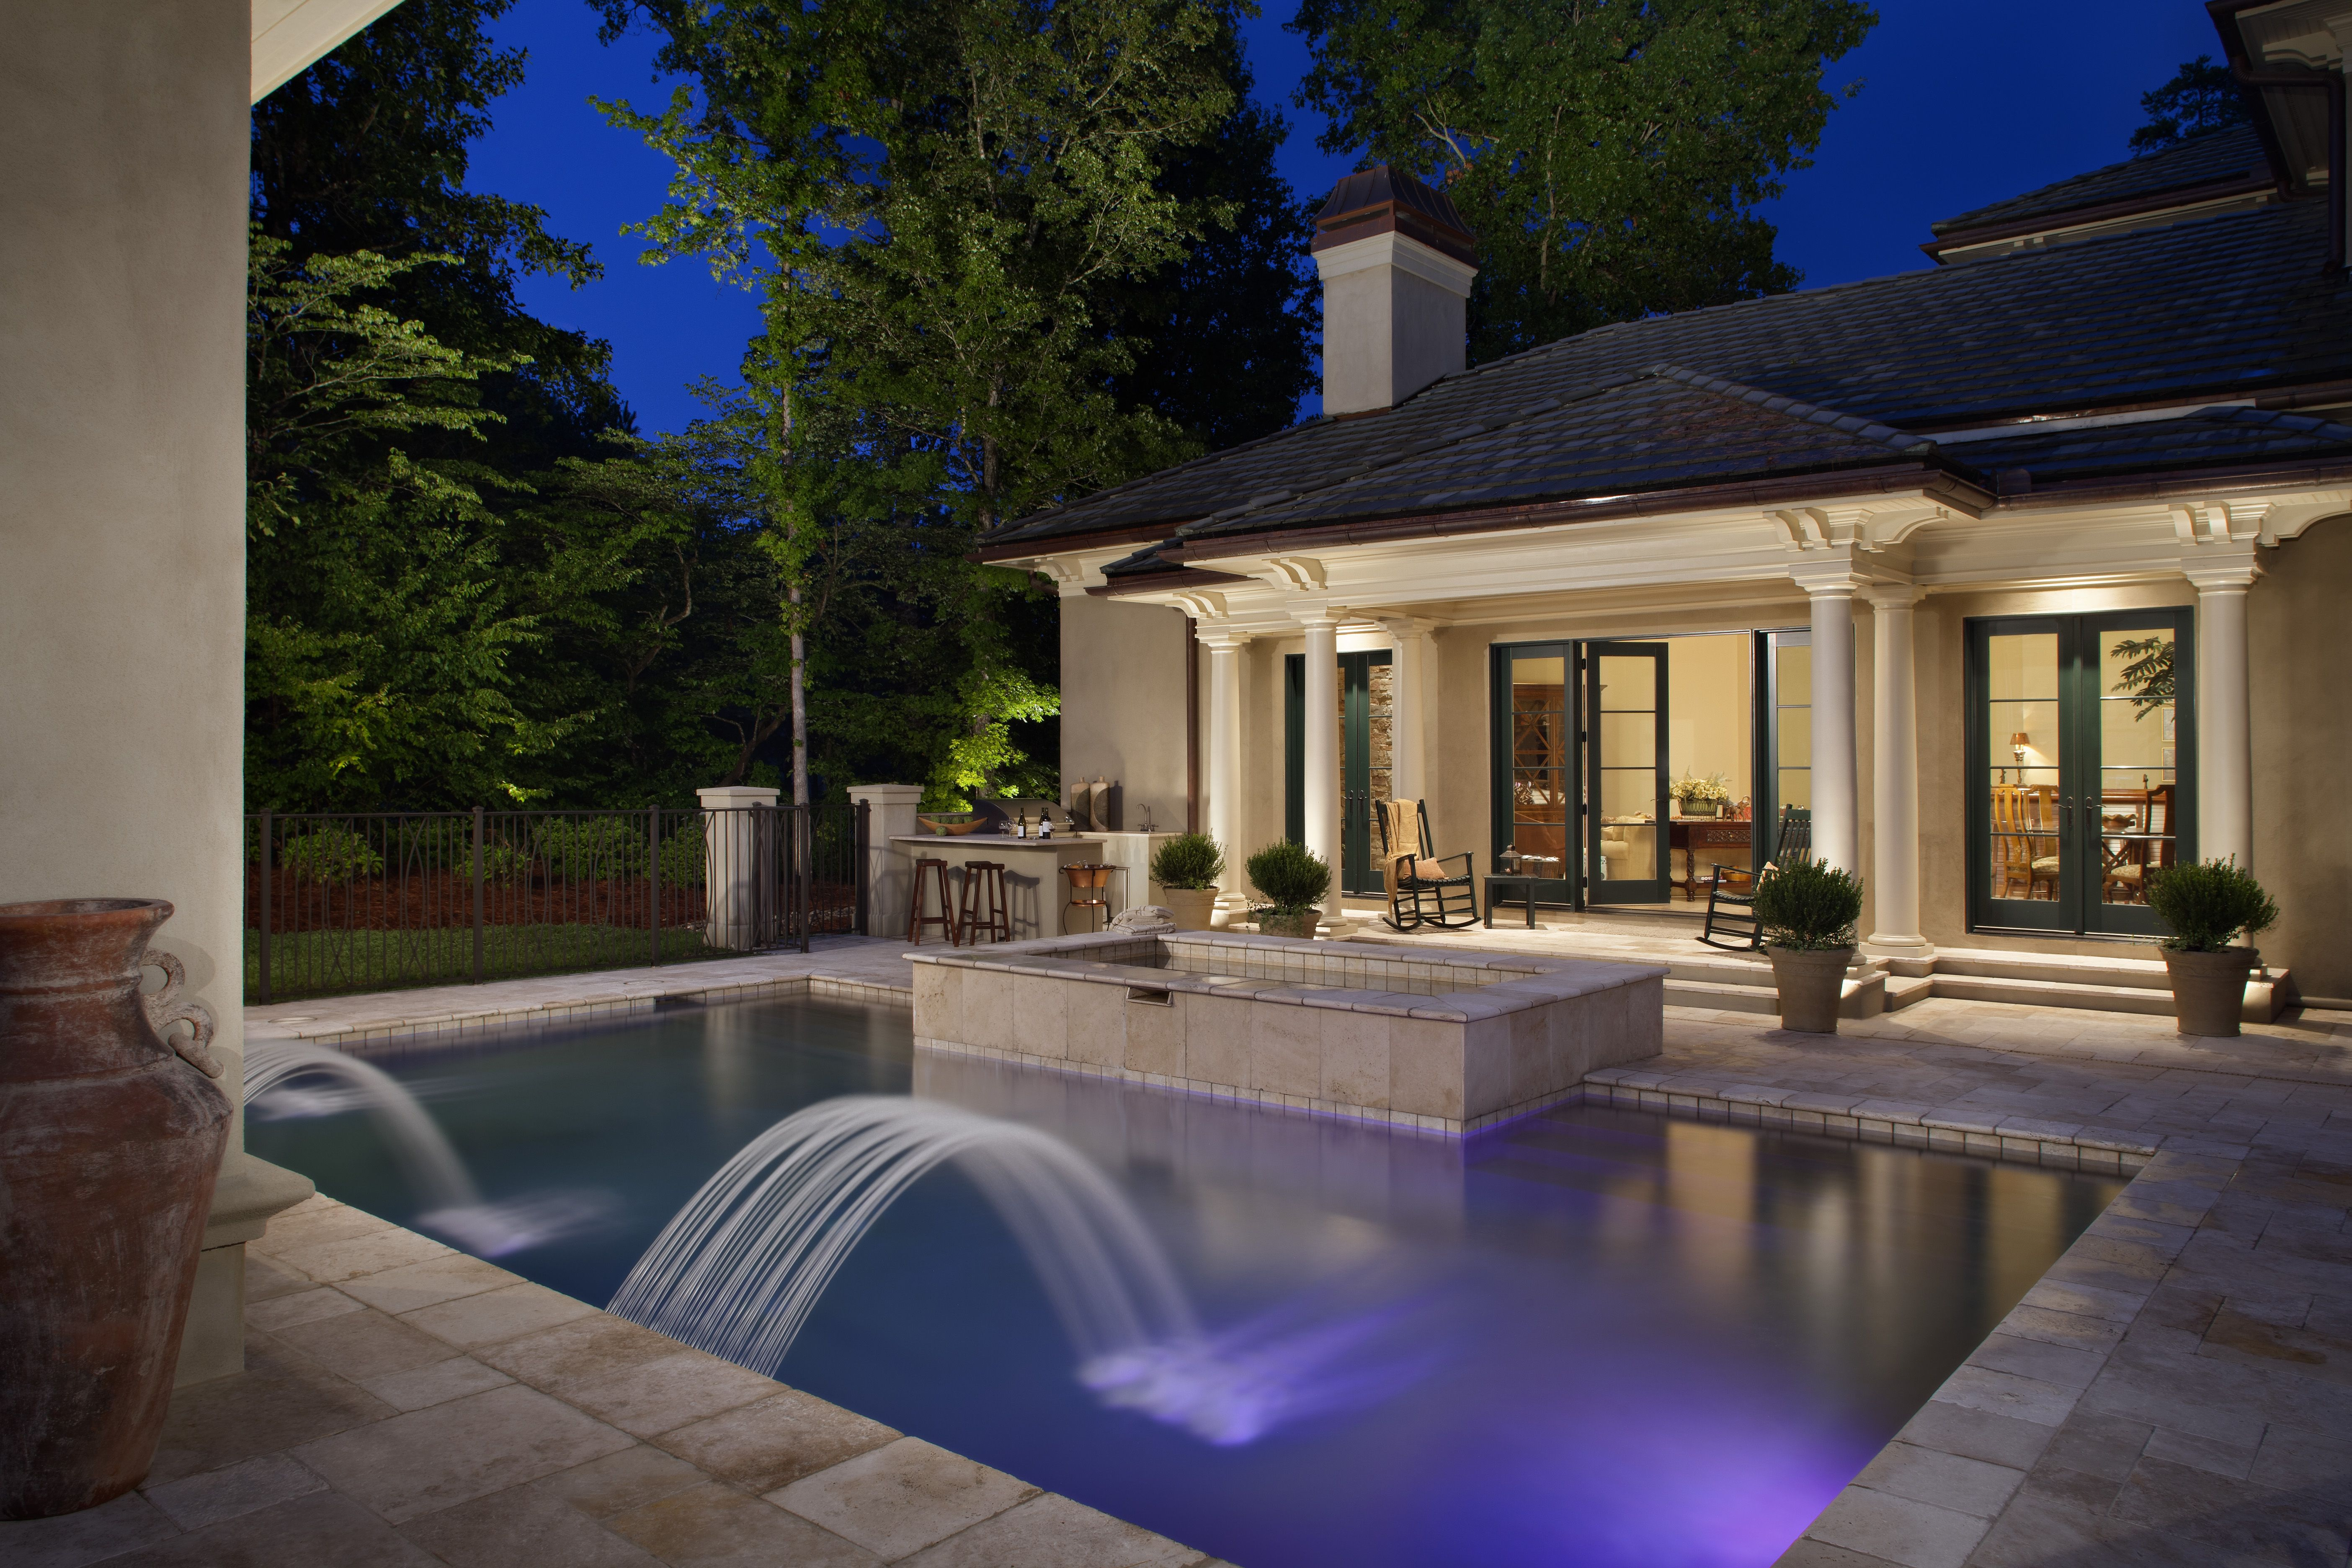 outdoor pool lighting. Lights Outdoor Pool Lighting